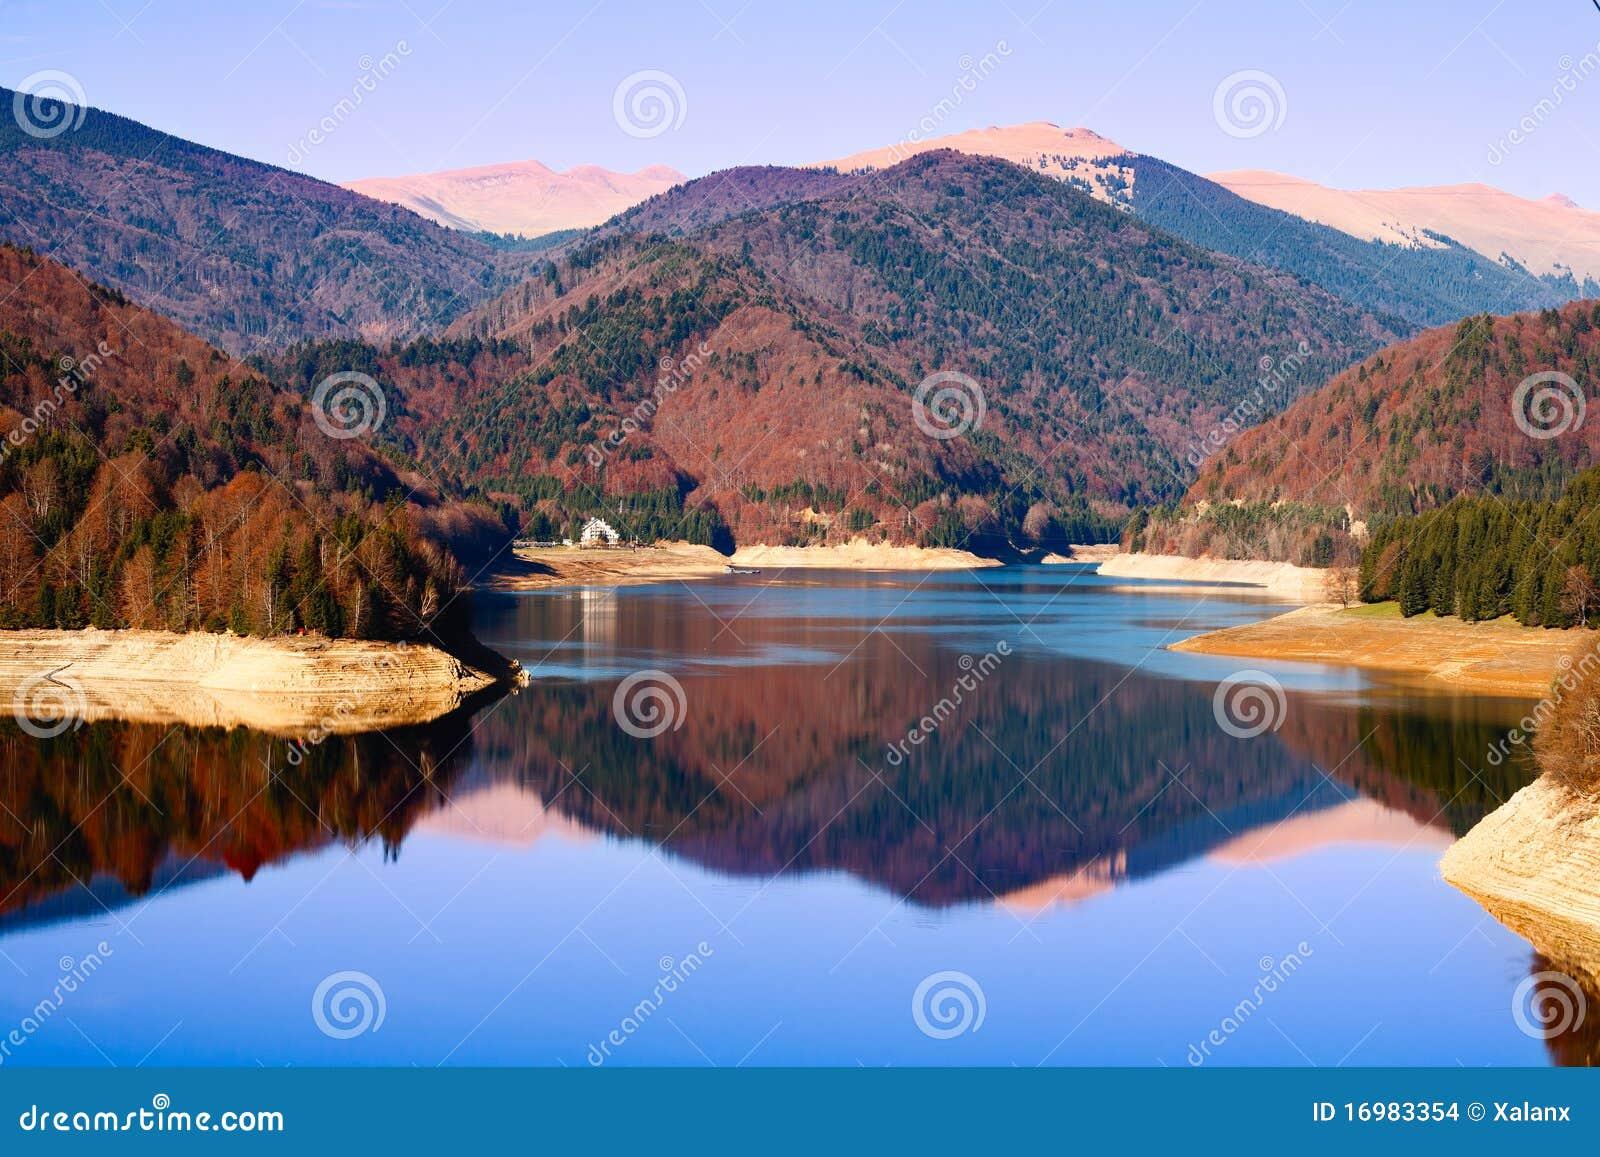 Vidraru Lake in Romania